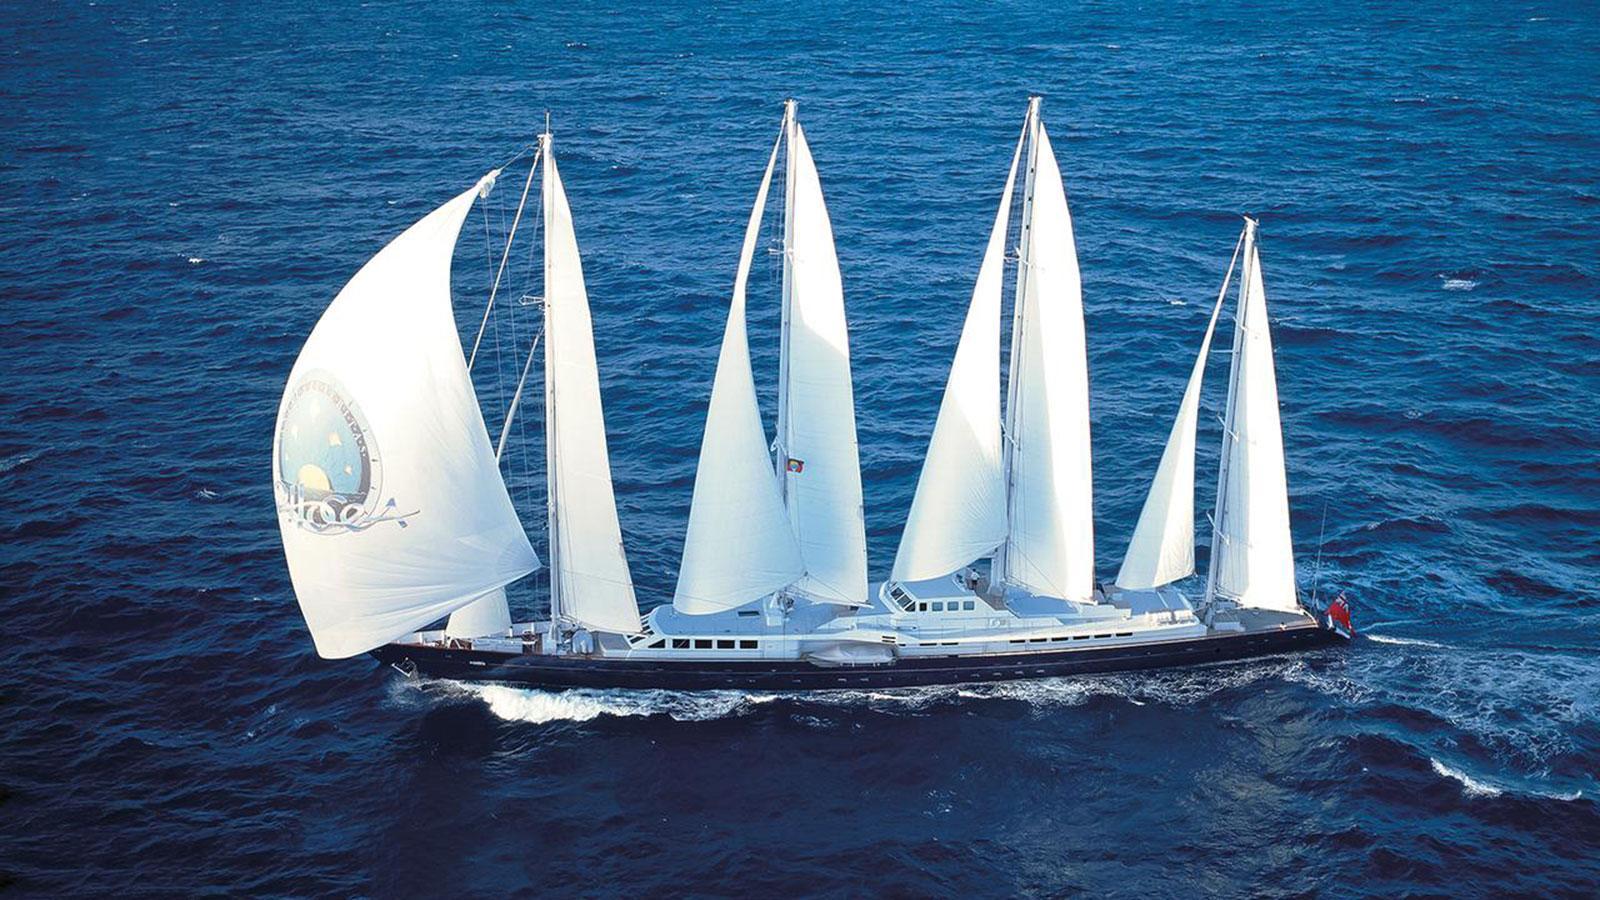 phocea-super-yacht-sailing-boat